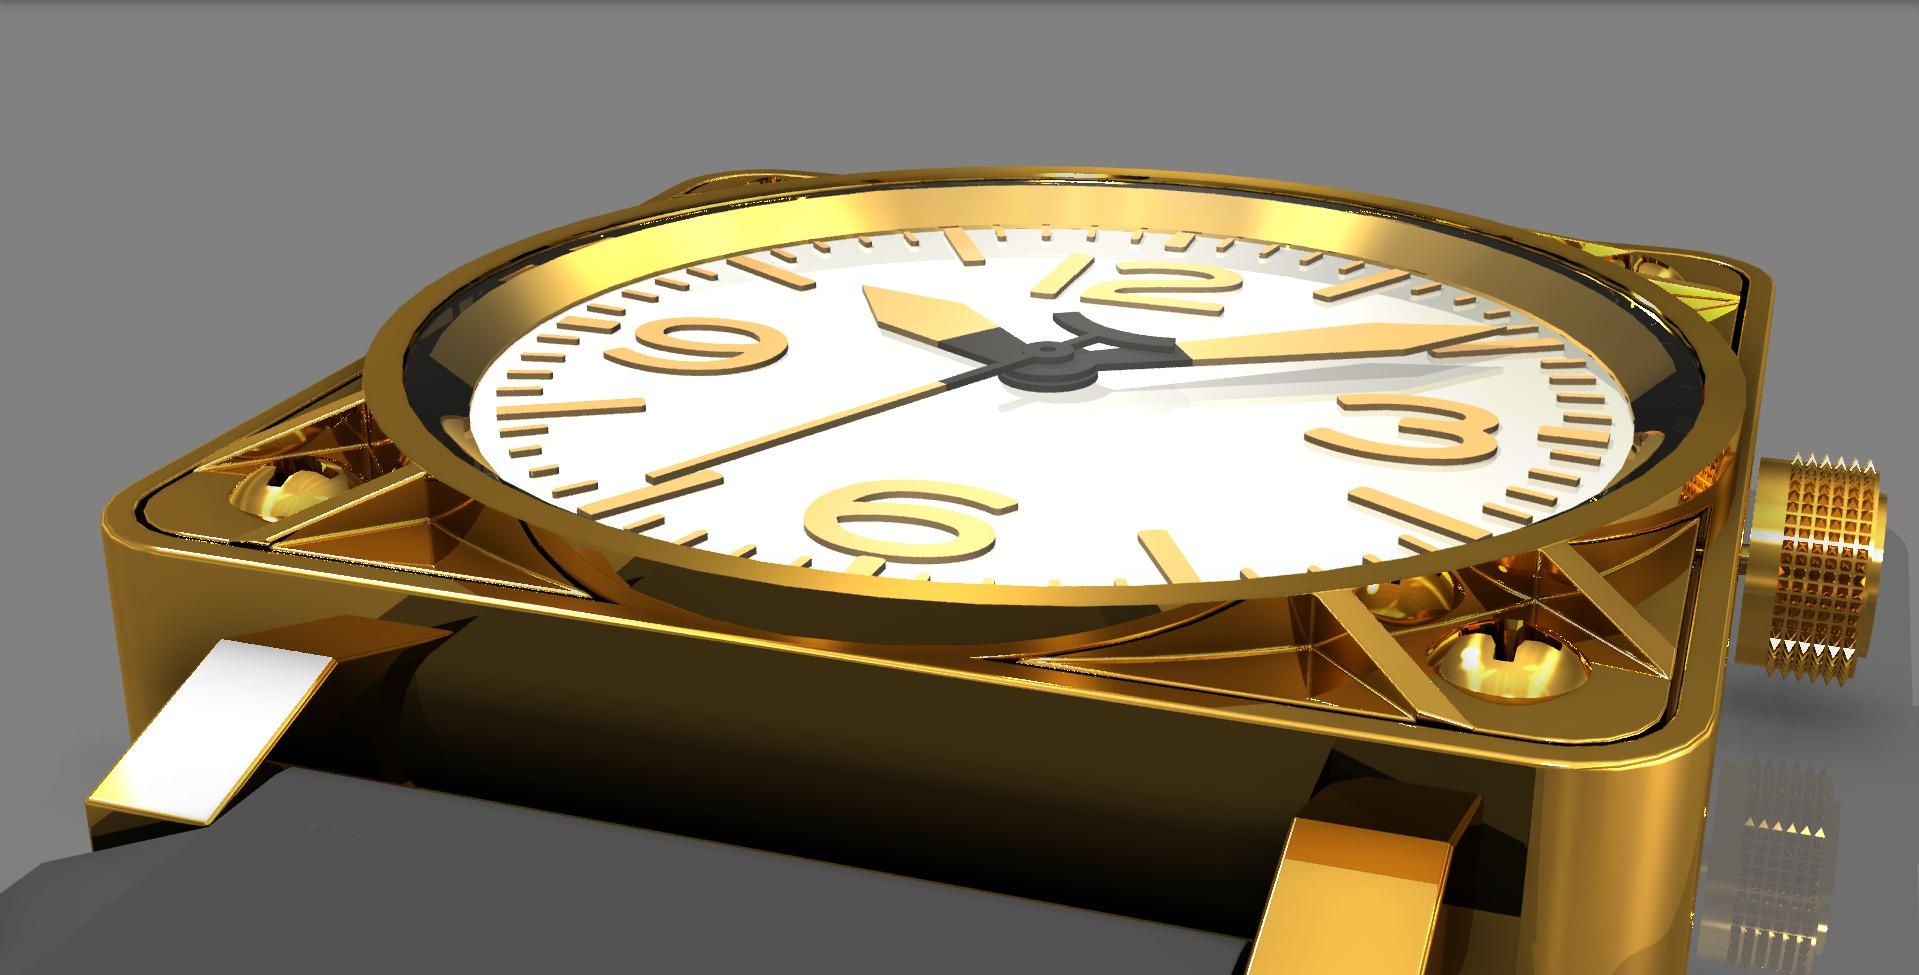 Replica_watch_assembled_angle2_brass